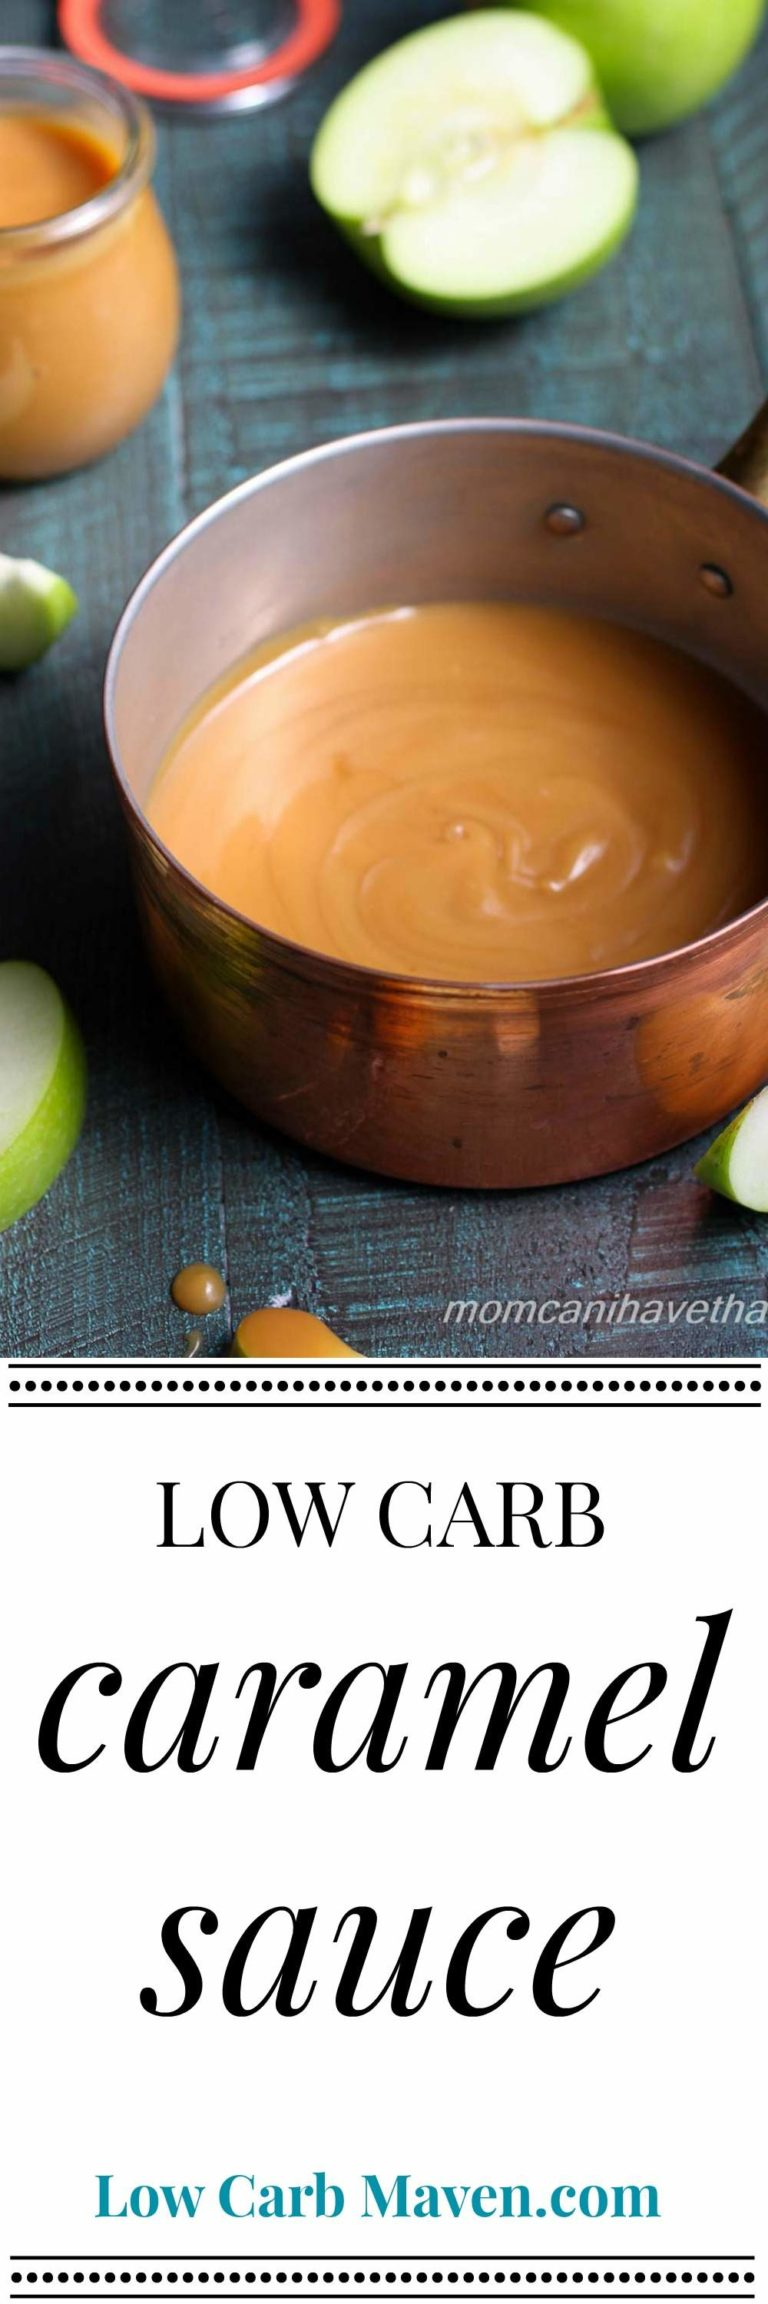 Homemade low carb caramel sauce is sugar free